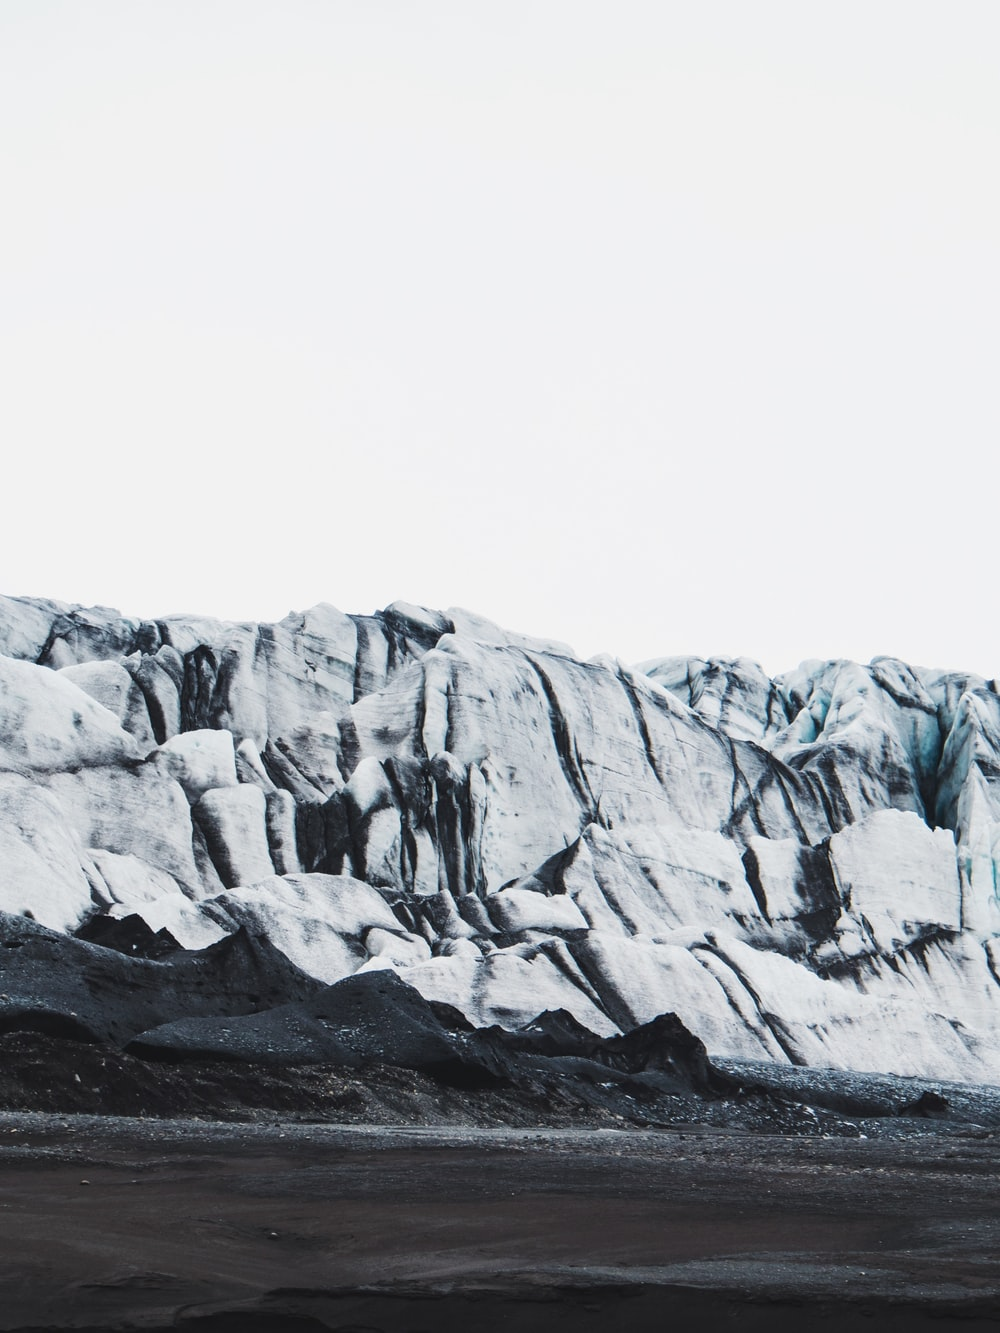 black sand near mountain during winter